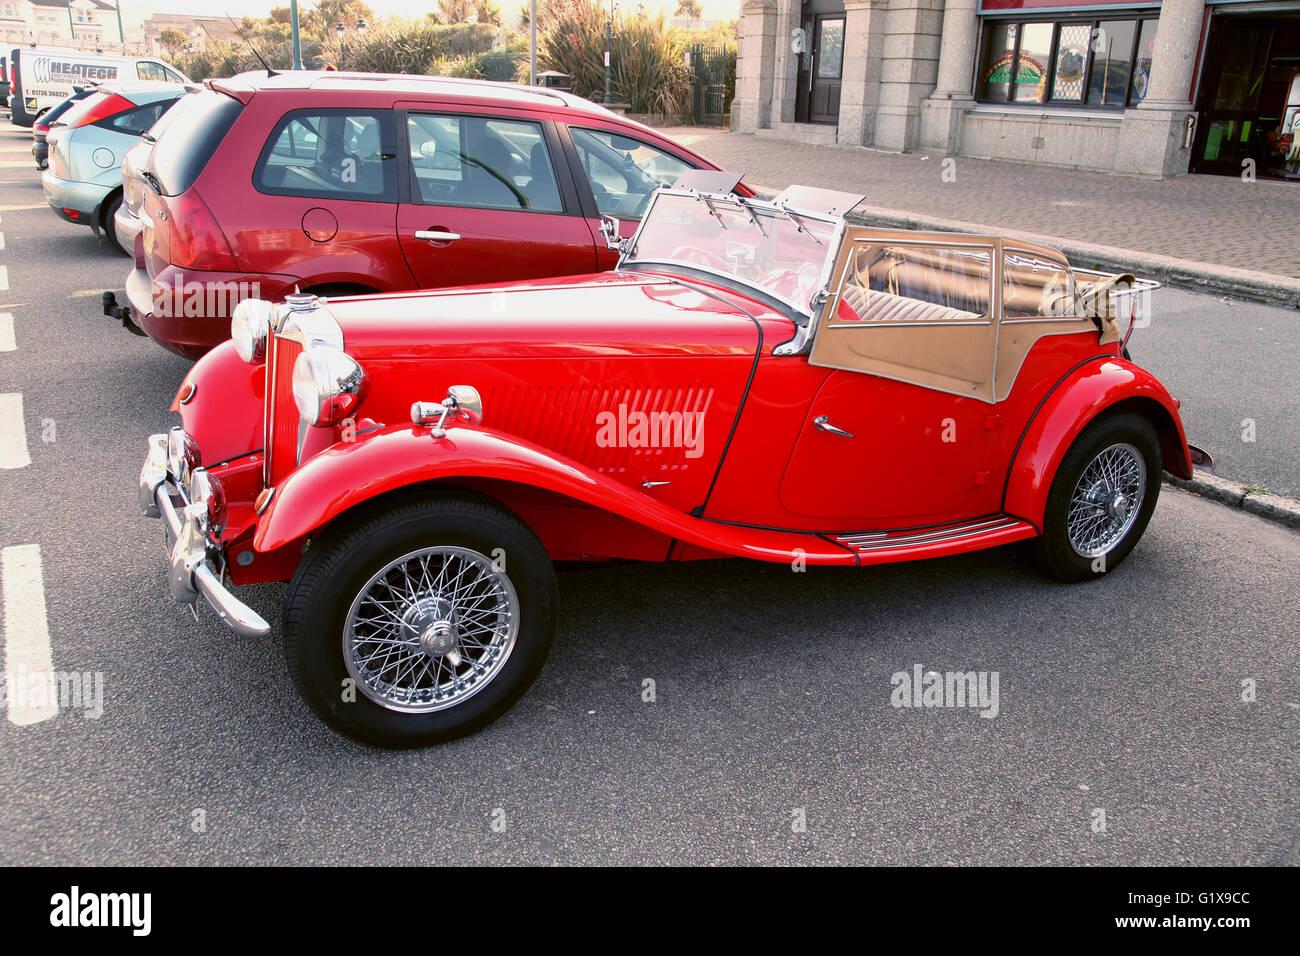 MG British sports car of 1952 - Stock Image